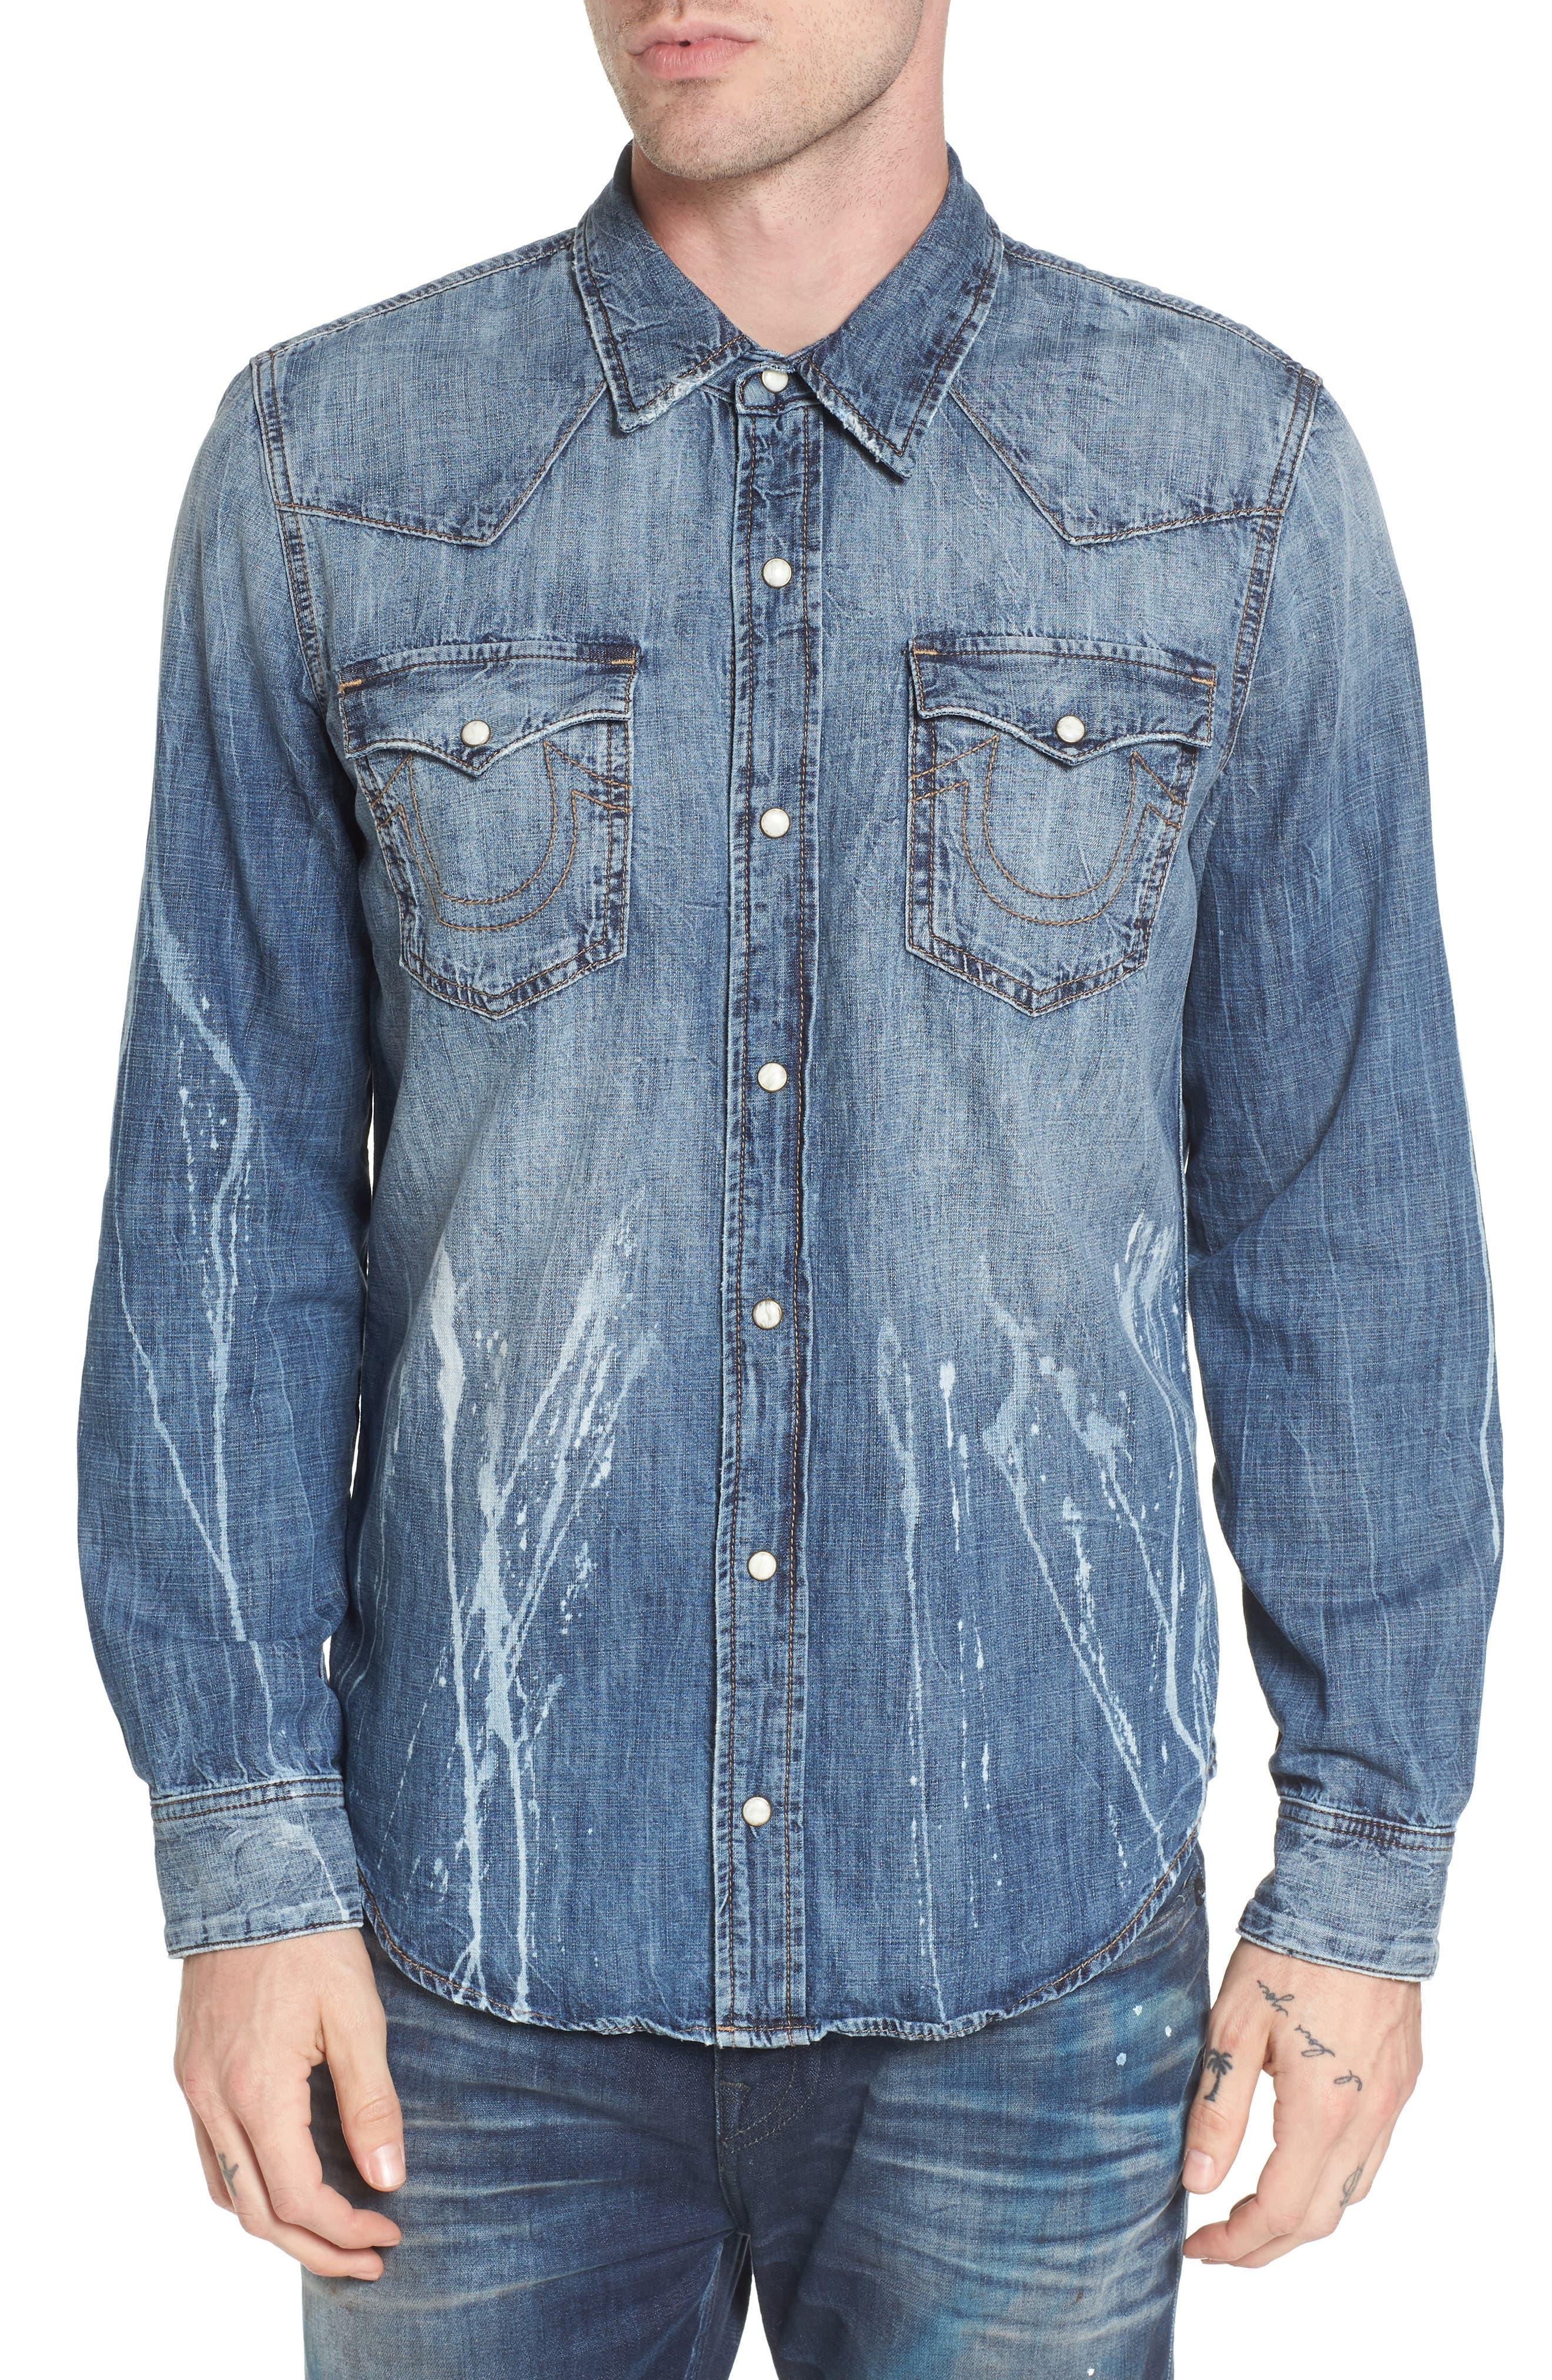 True Religion Brand Jeans Ryan Runyon Rebel Short Sleeve Western Shirt